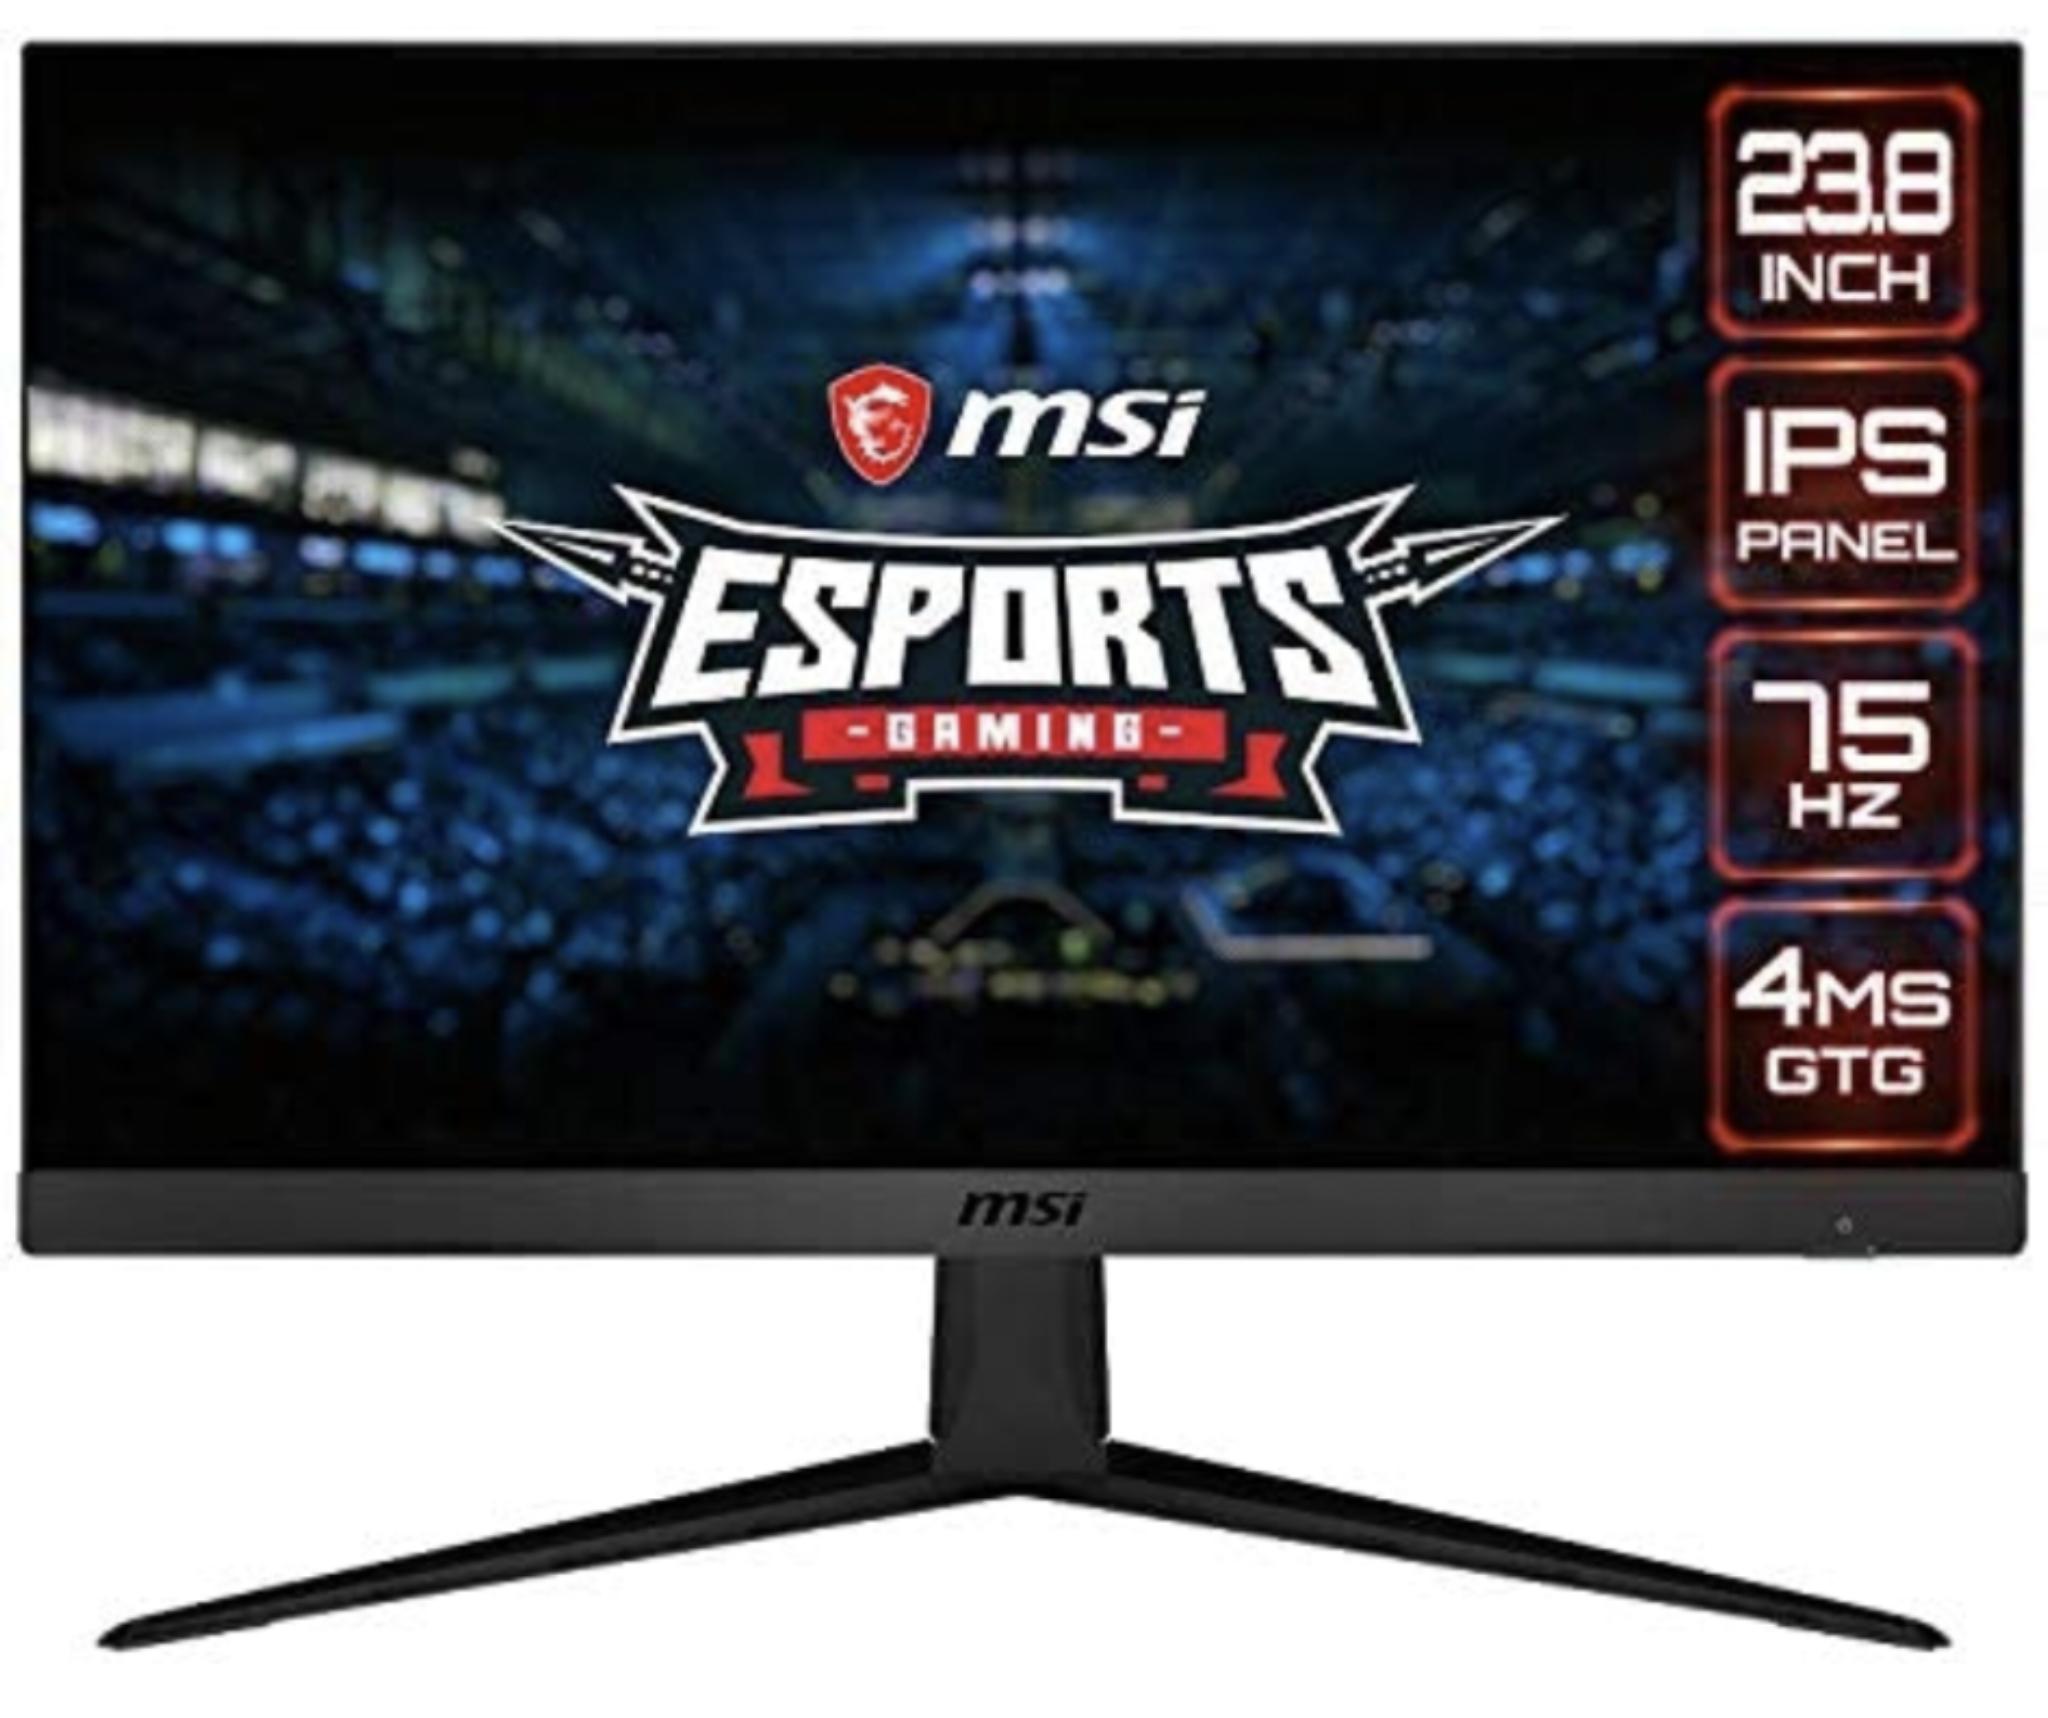 MSI Optix G241V 23.6 INCH FHD Monitor £109 @ Amazon